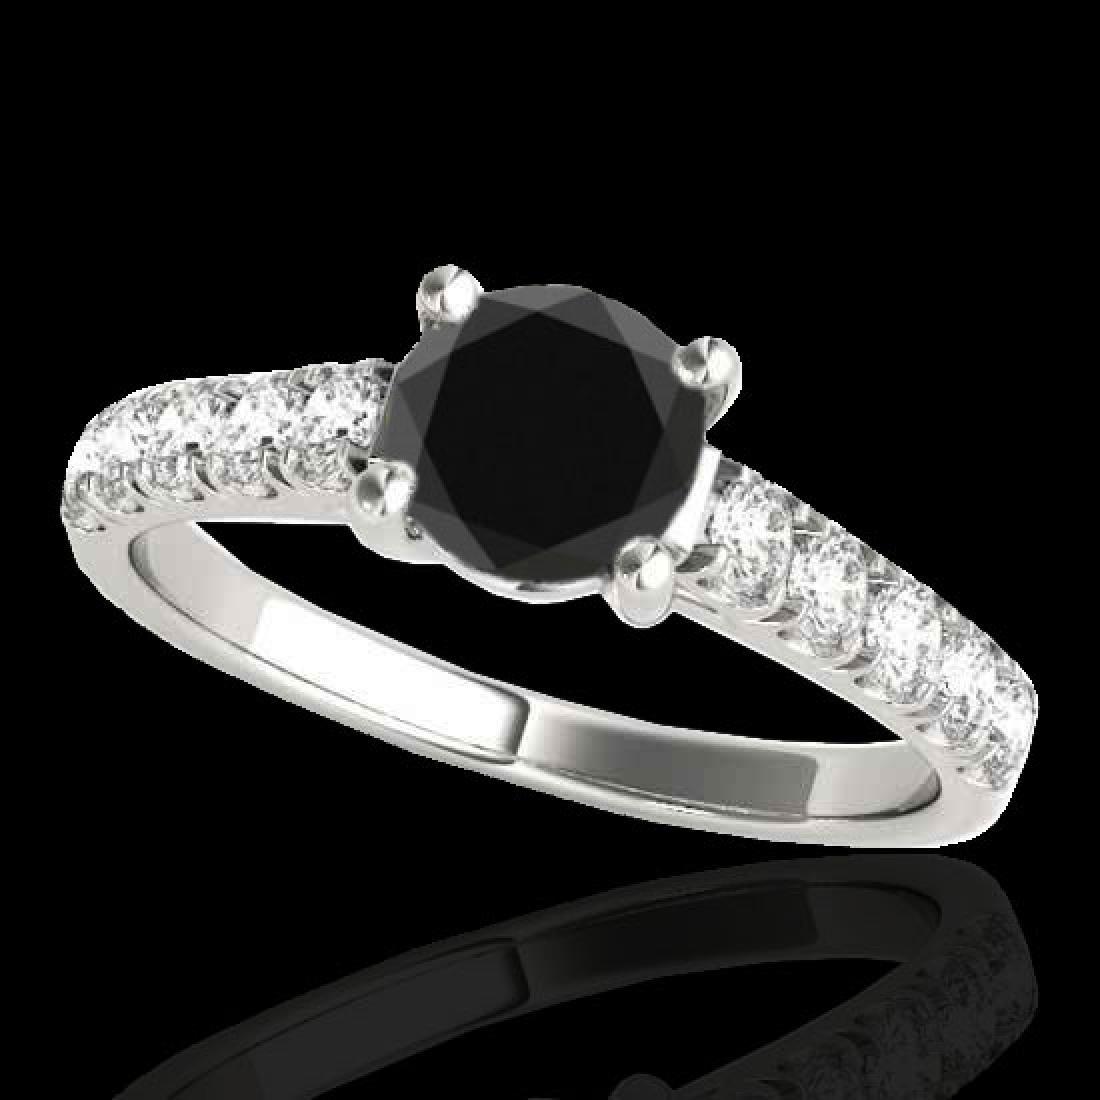 1.55 CTW Certified VS Black Diamond Solitaire Ring 10K